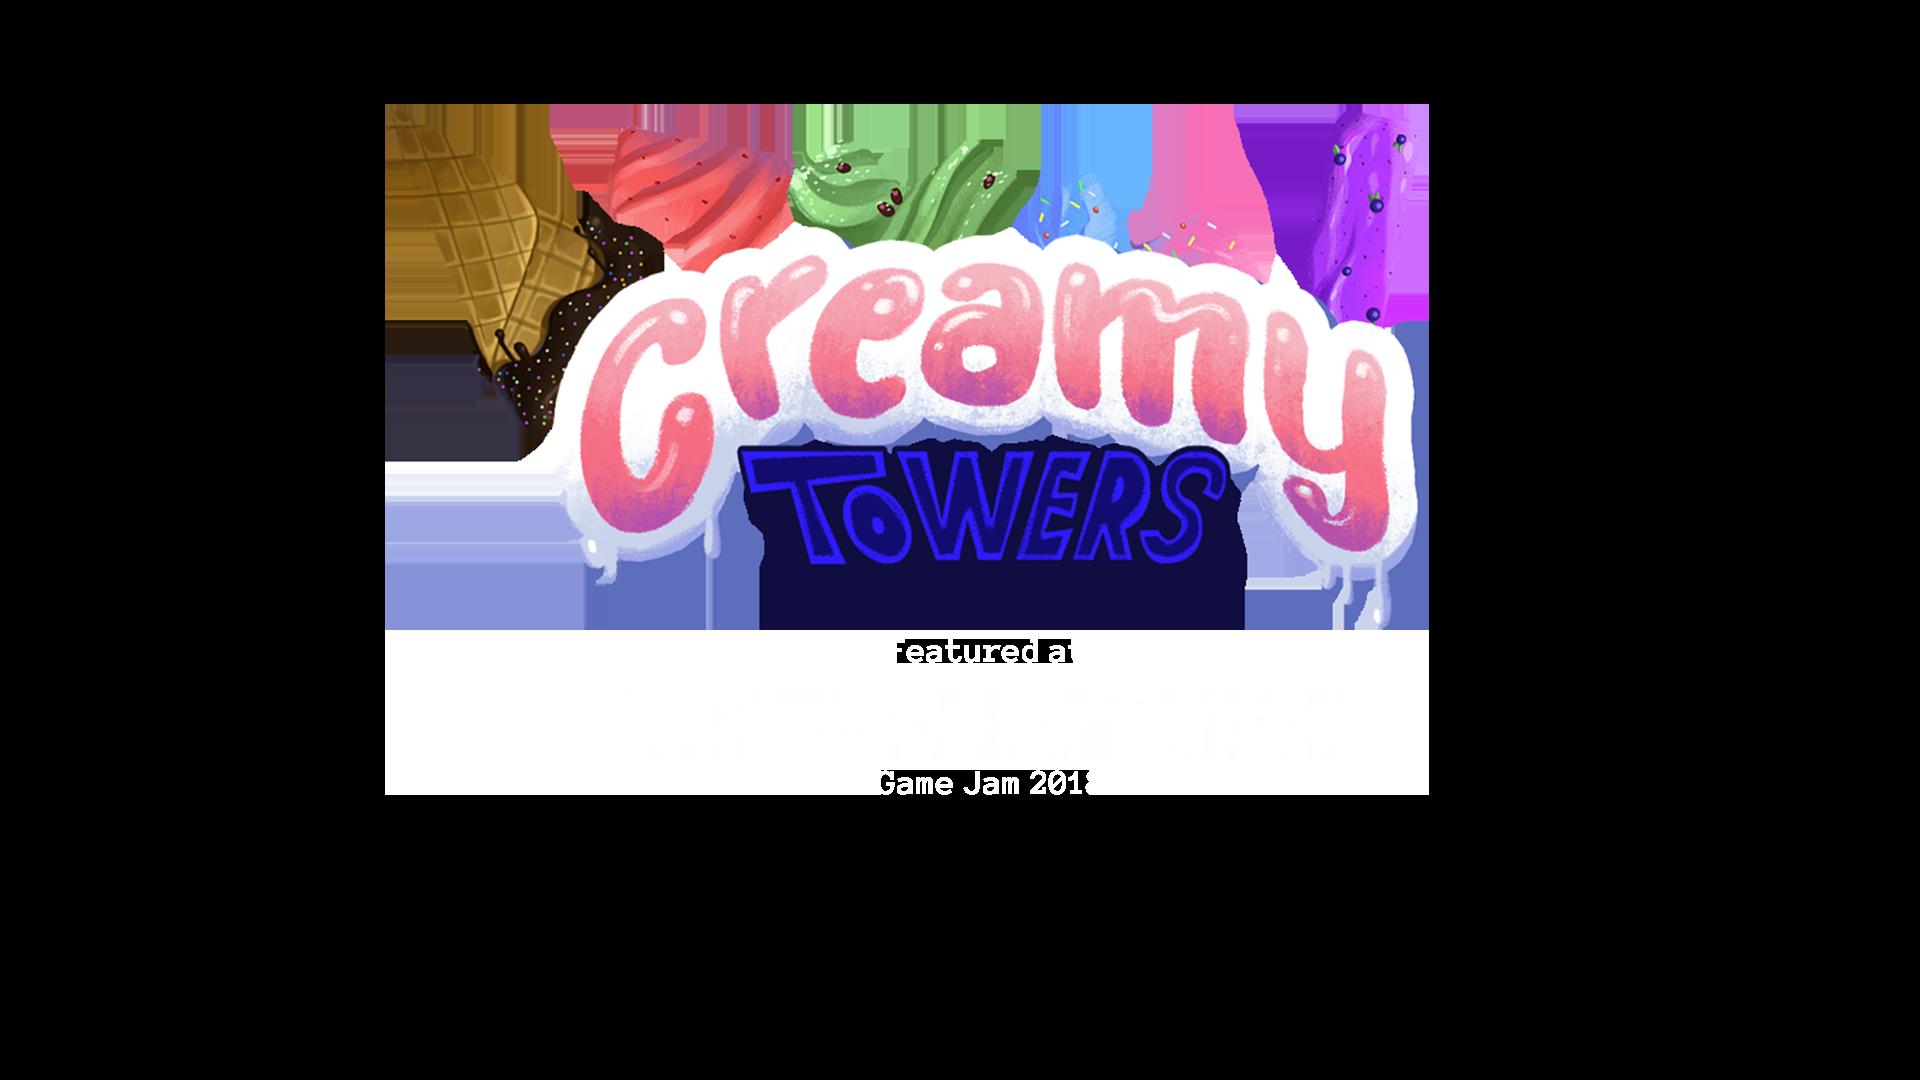 Creamy Towers